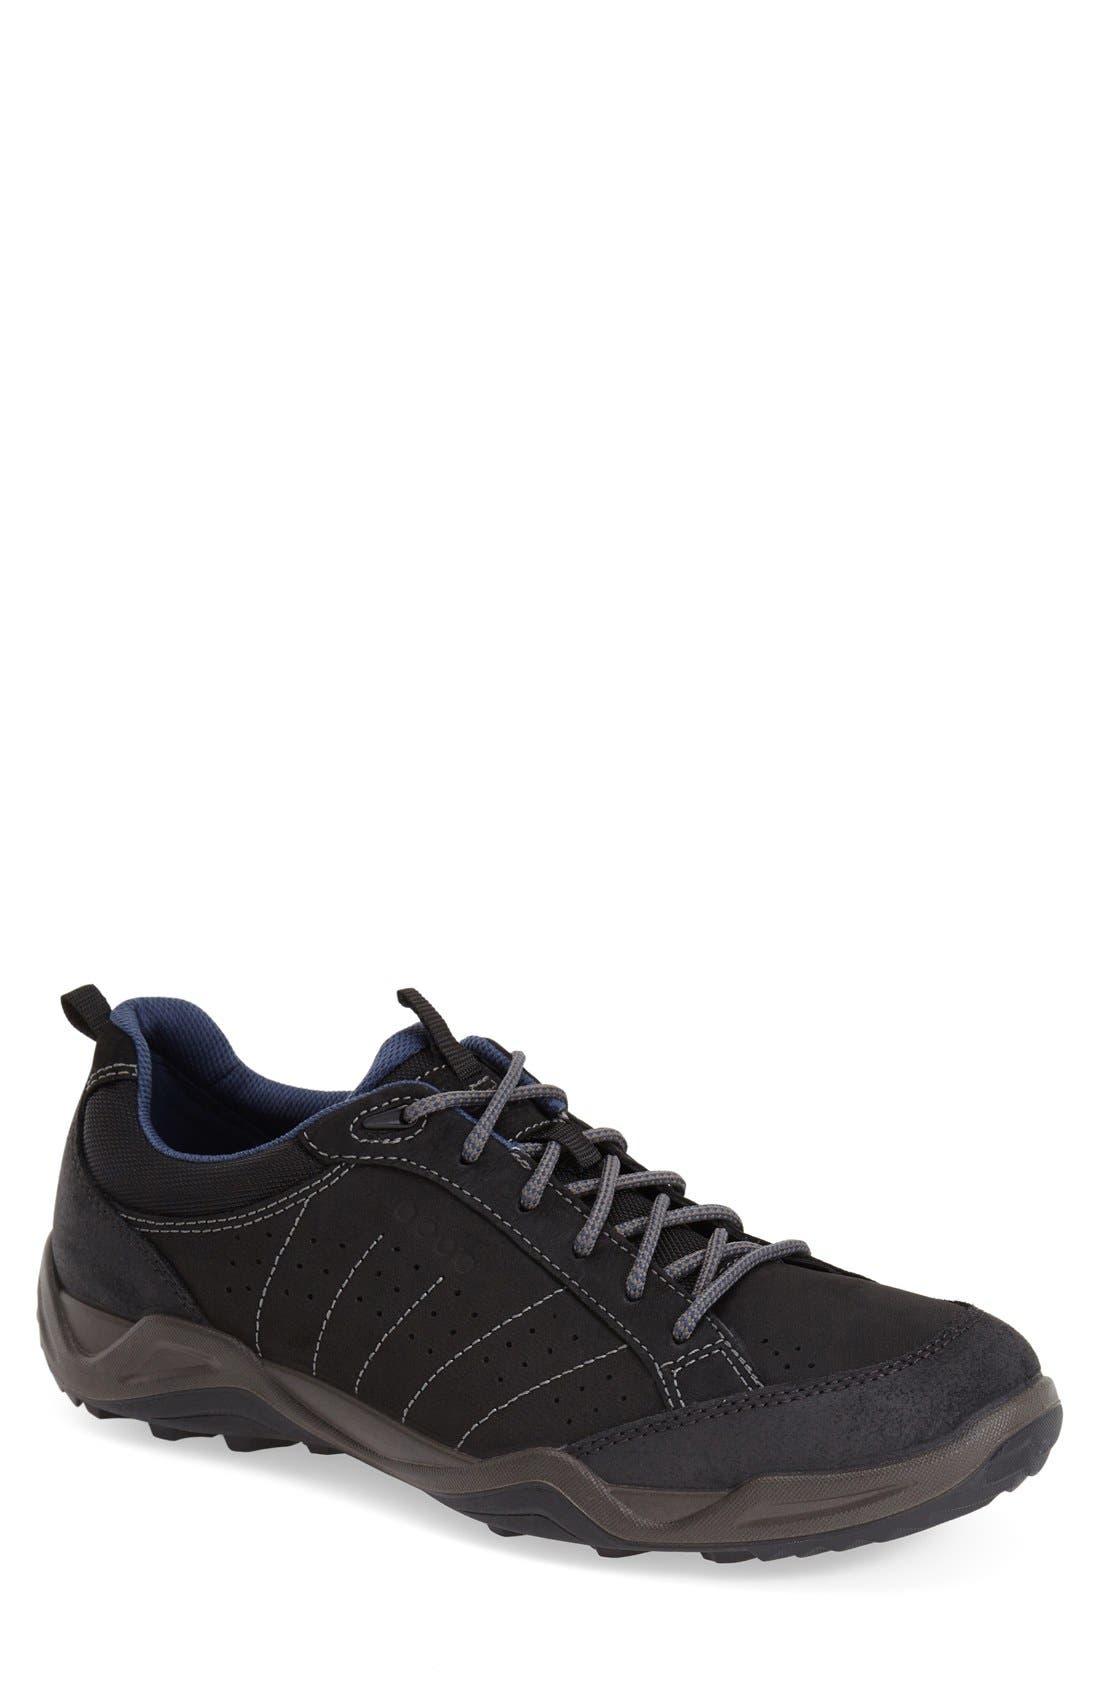 'Sierra II' Sneaker,                             Main thumbnail 1, color,                             003